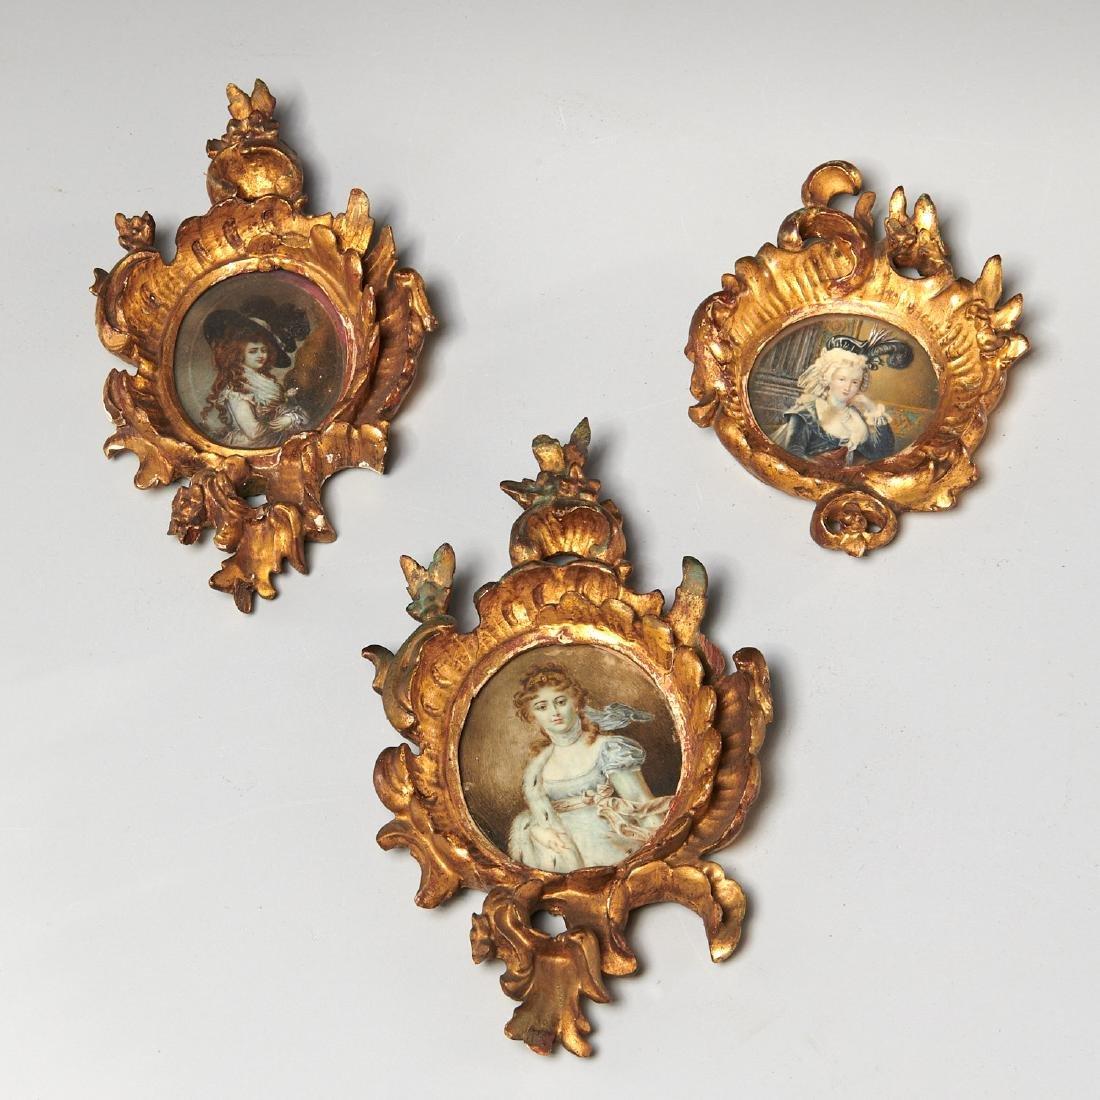 (3) French portrait miniatures of Court Ladies